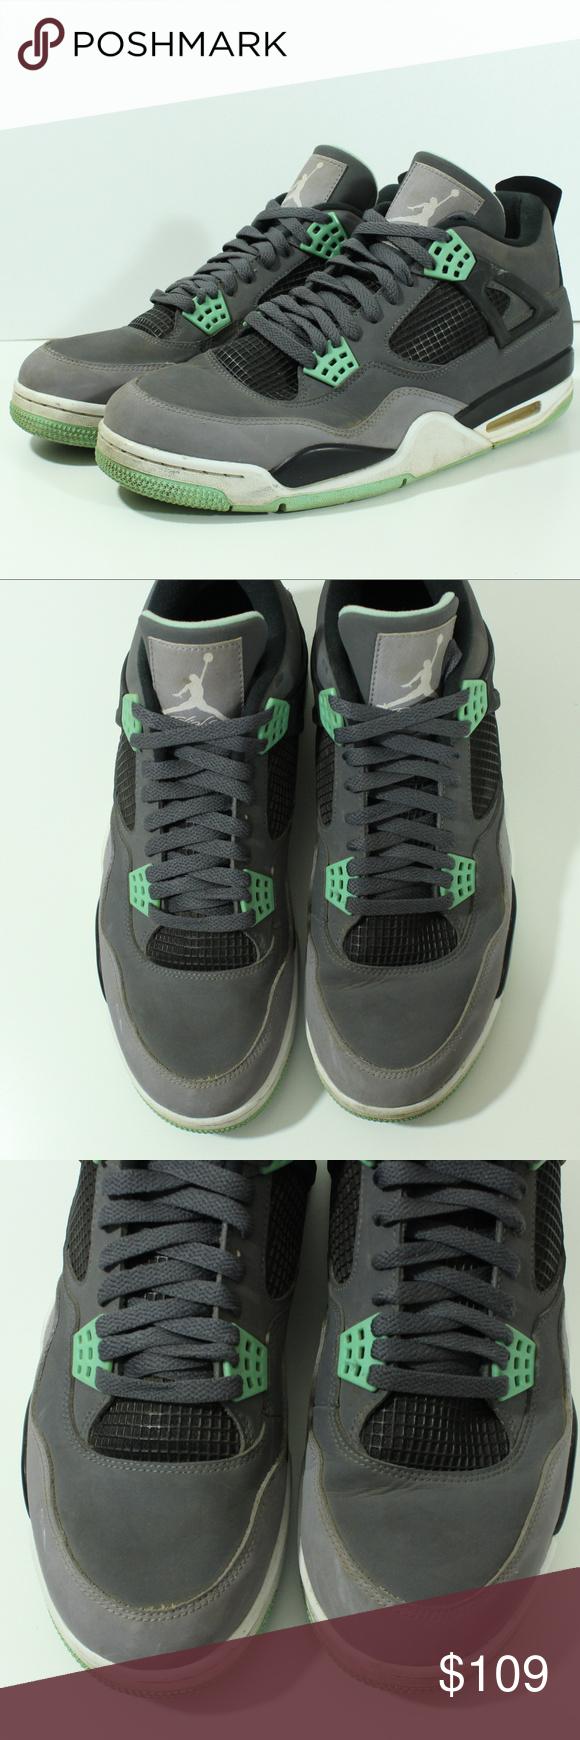 611390d40644 Nike Air Jordan Retro Green Glow IV 4 308497-033 100% Authentic Nike Air